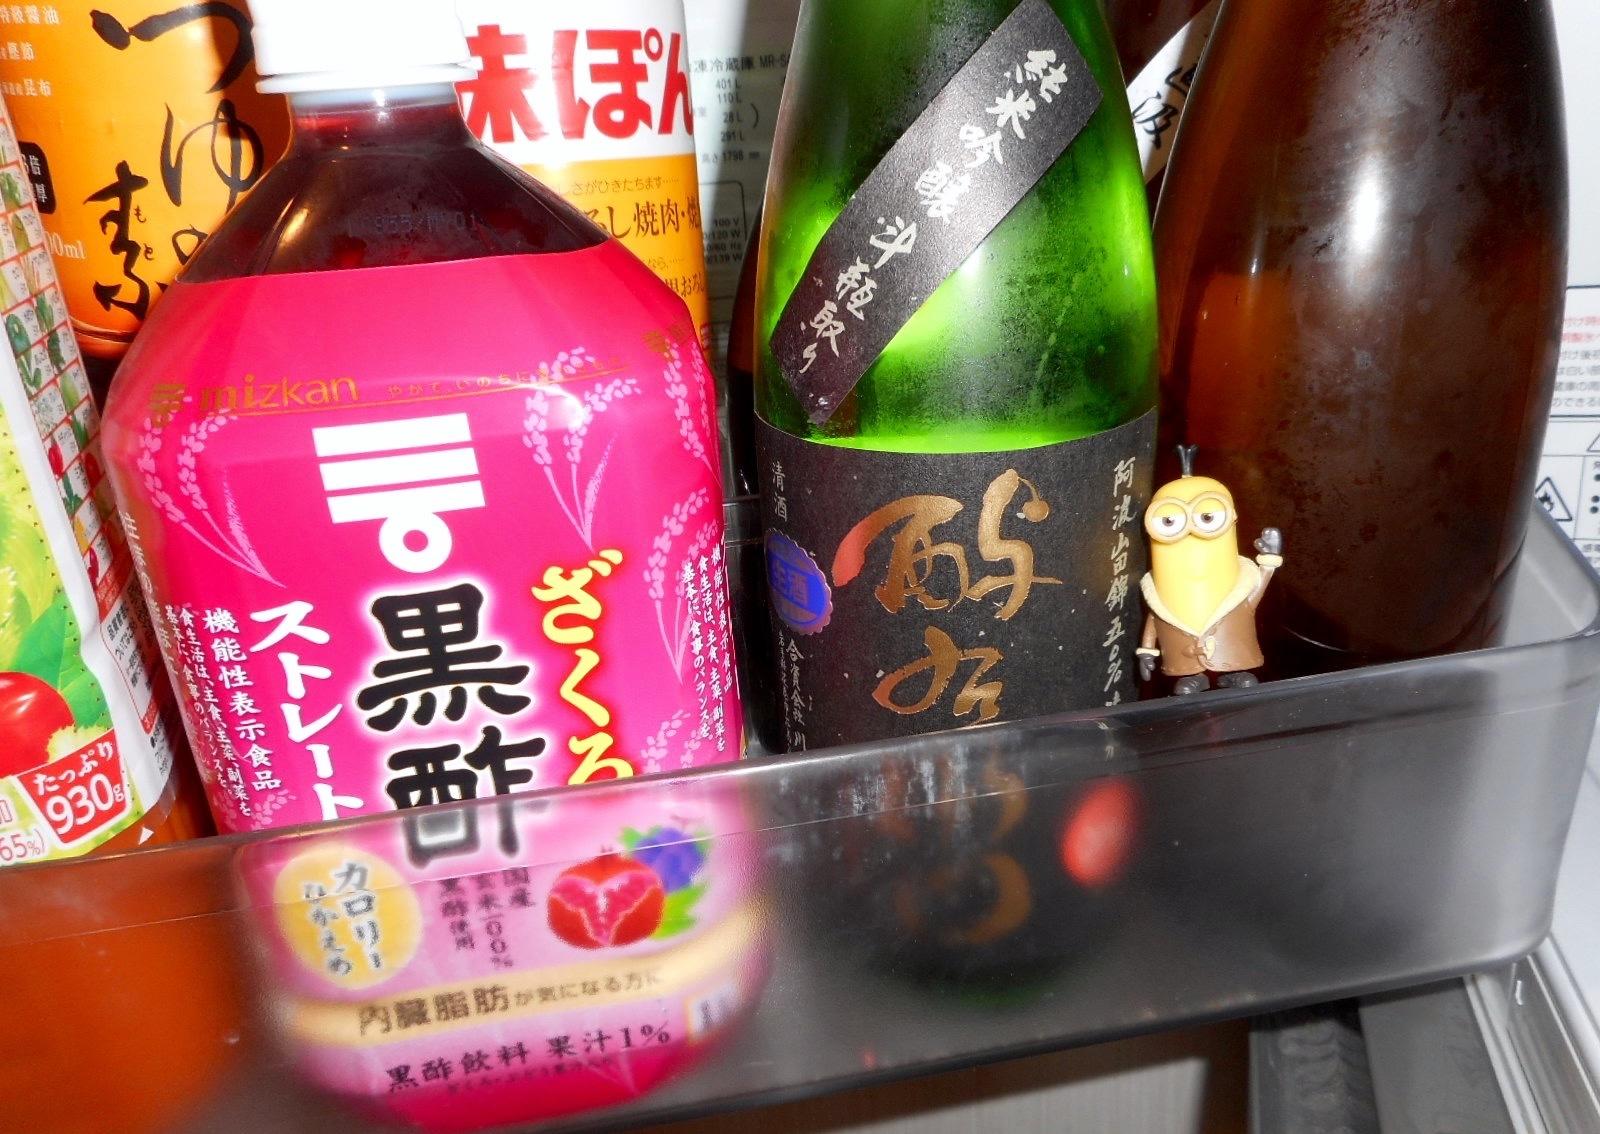 yoemon_yamada50tobin28by1.jpg